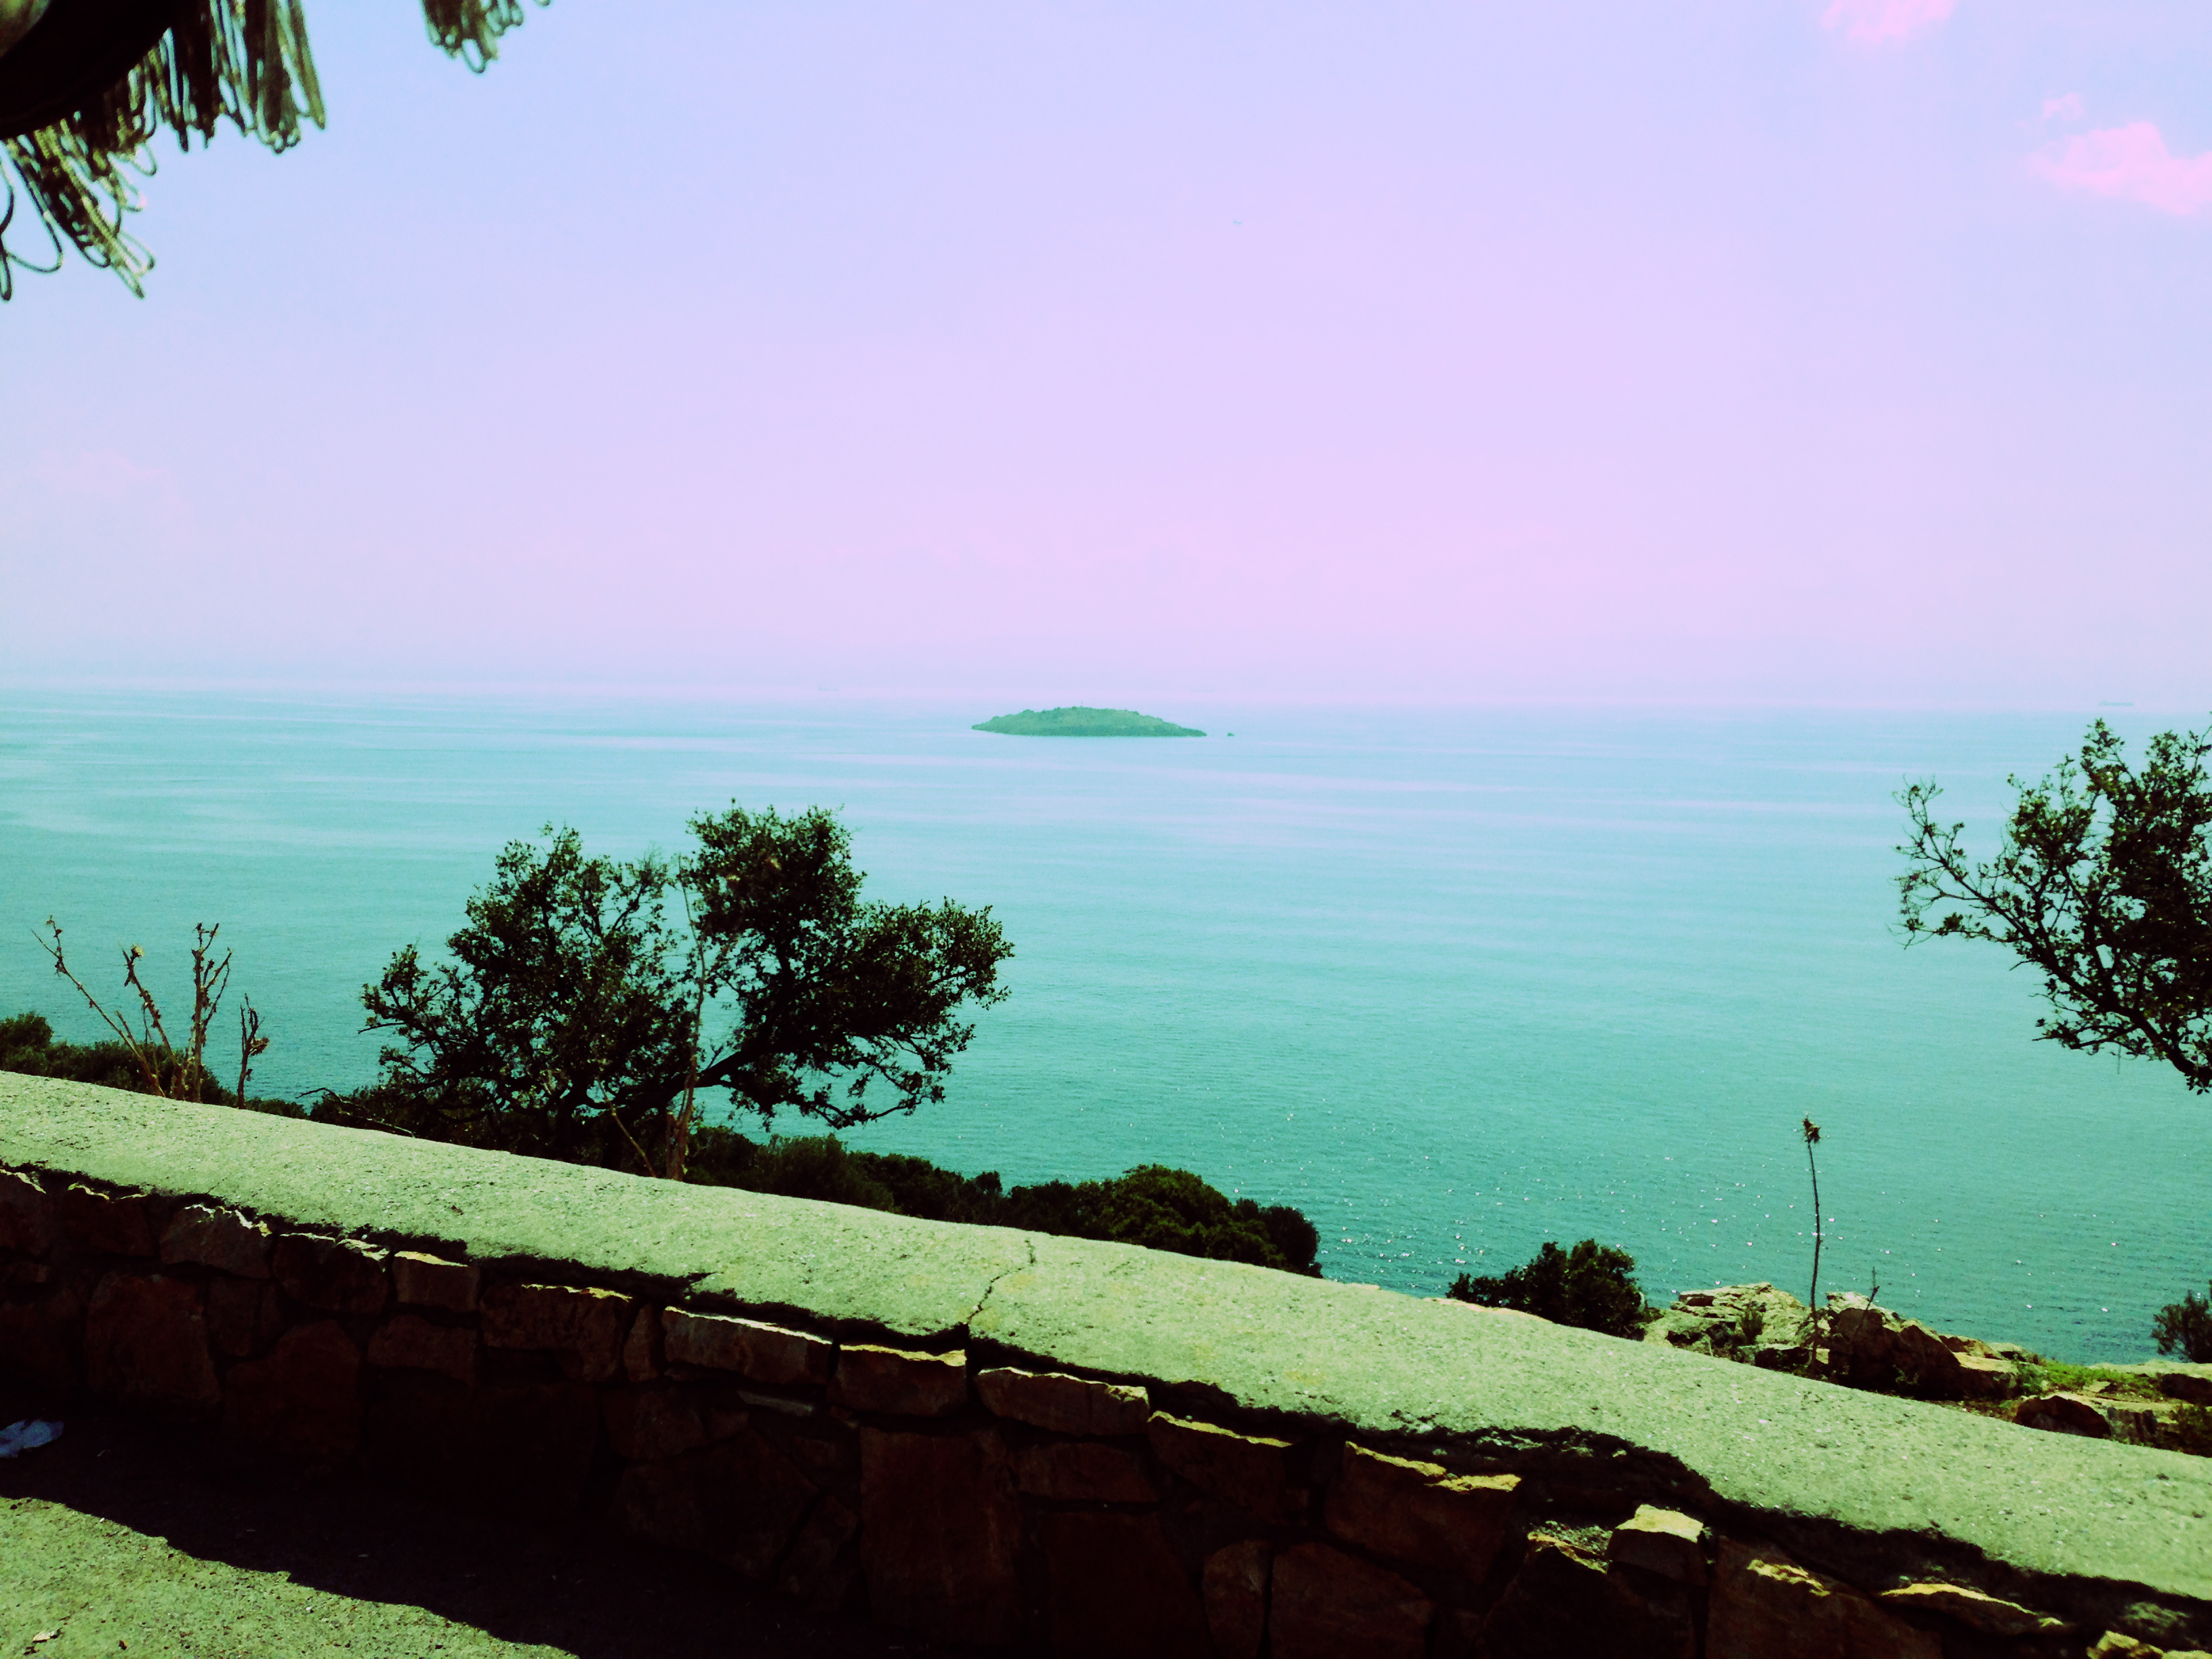 Vista do alto da ilha